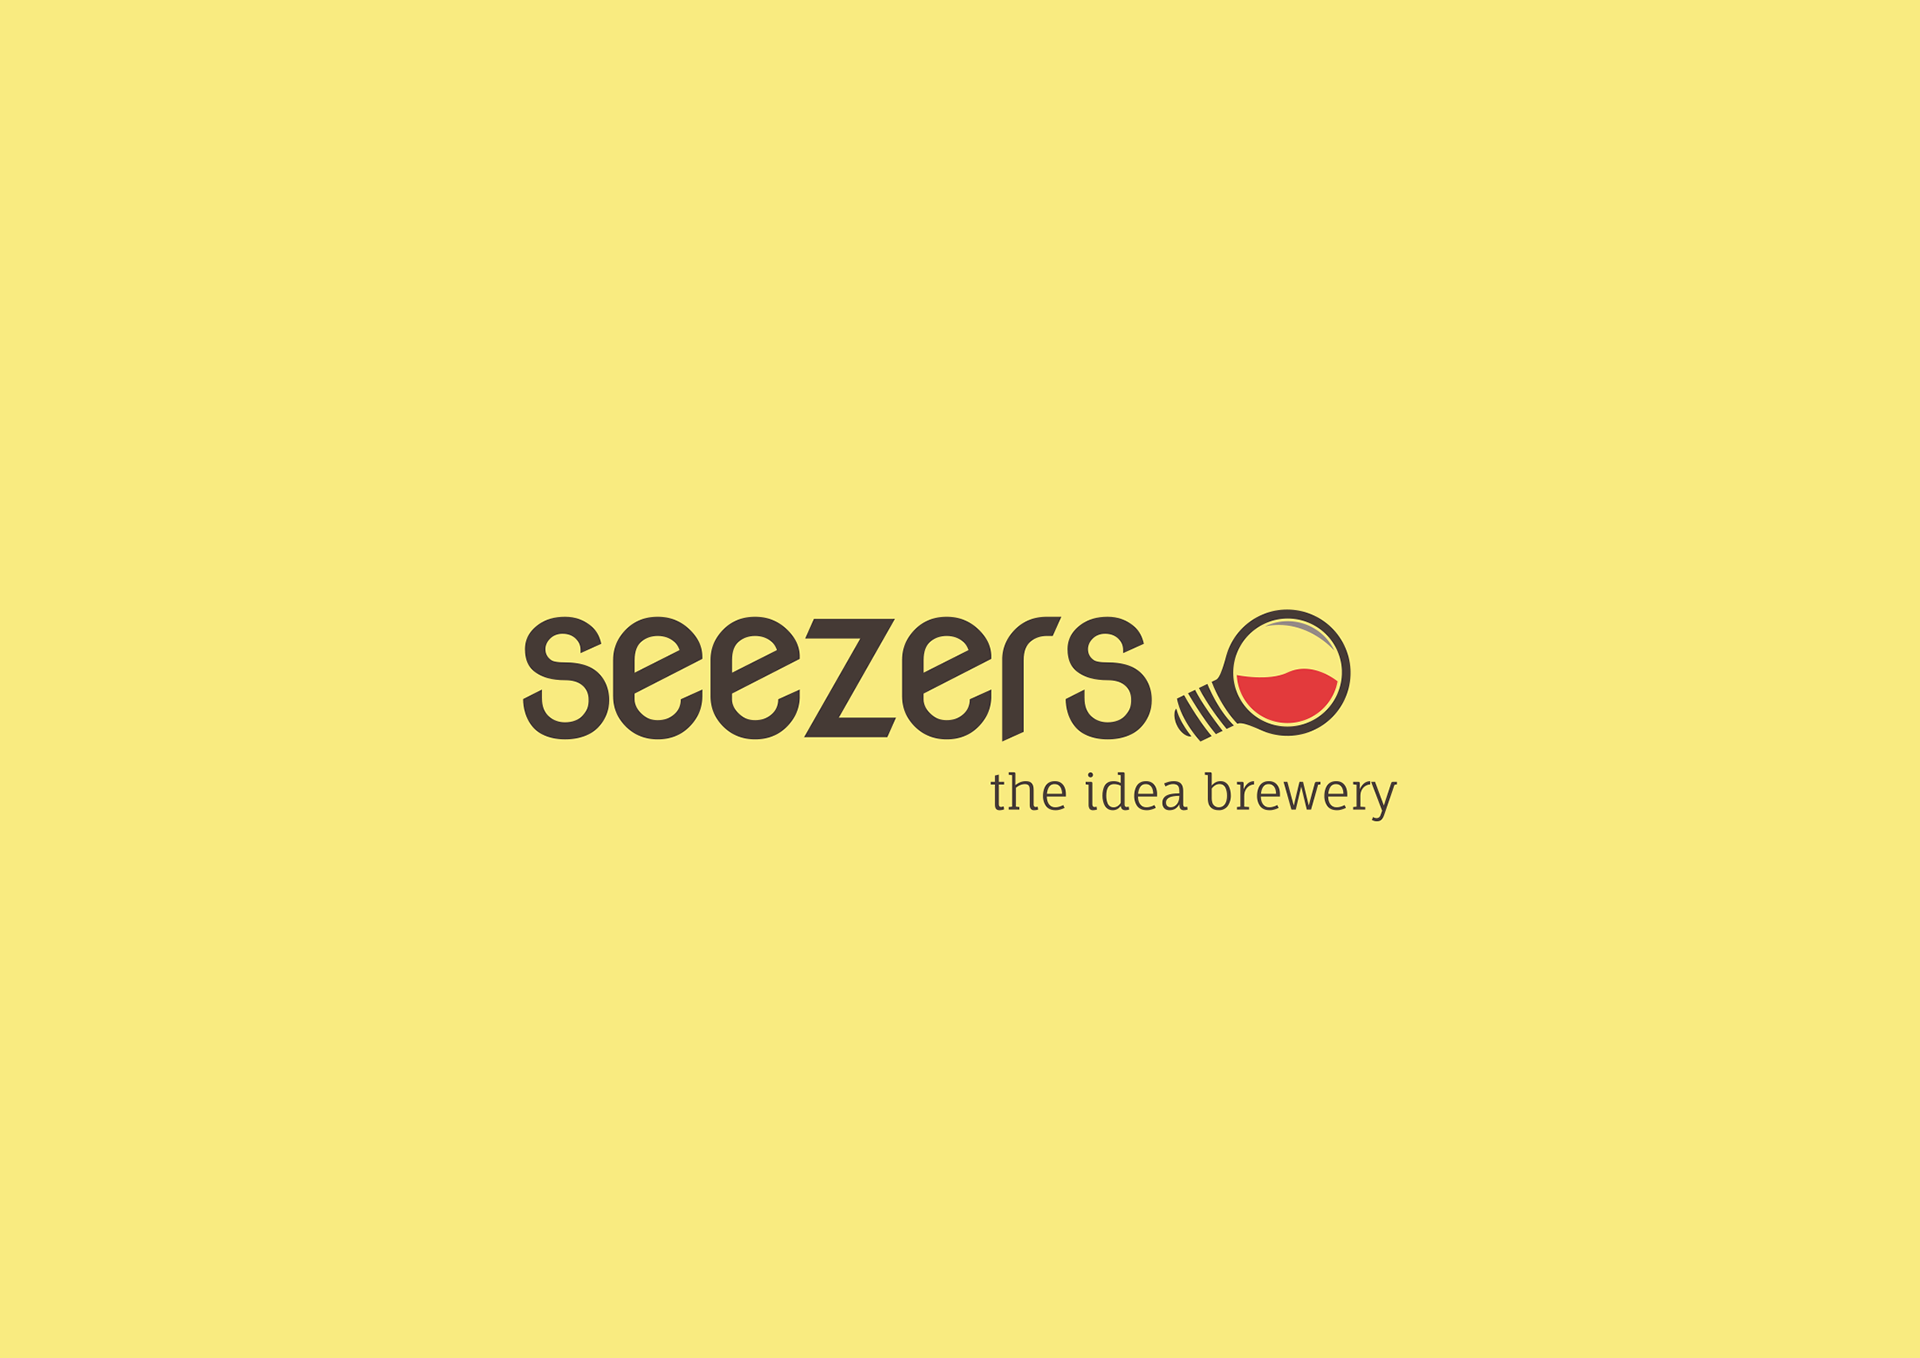 Seezers main logo